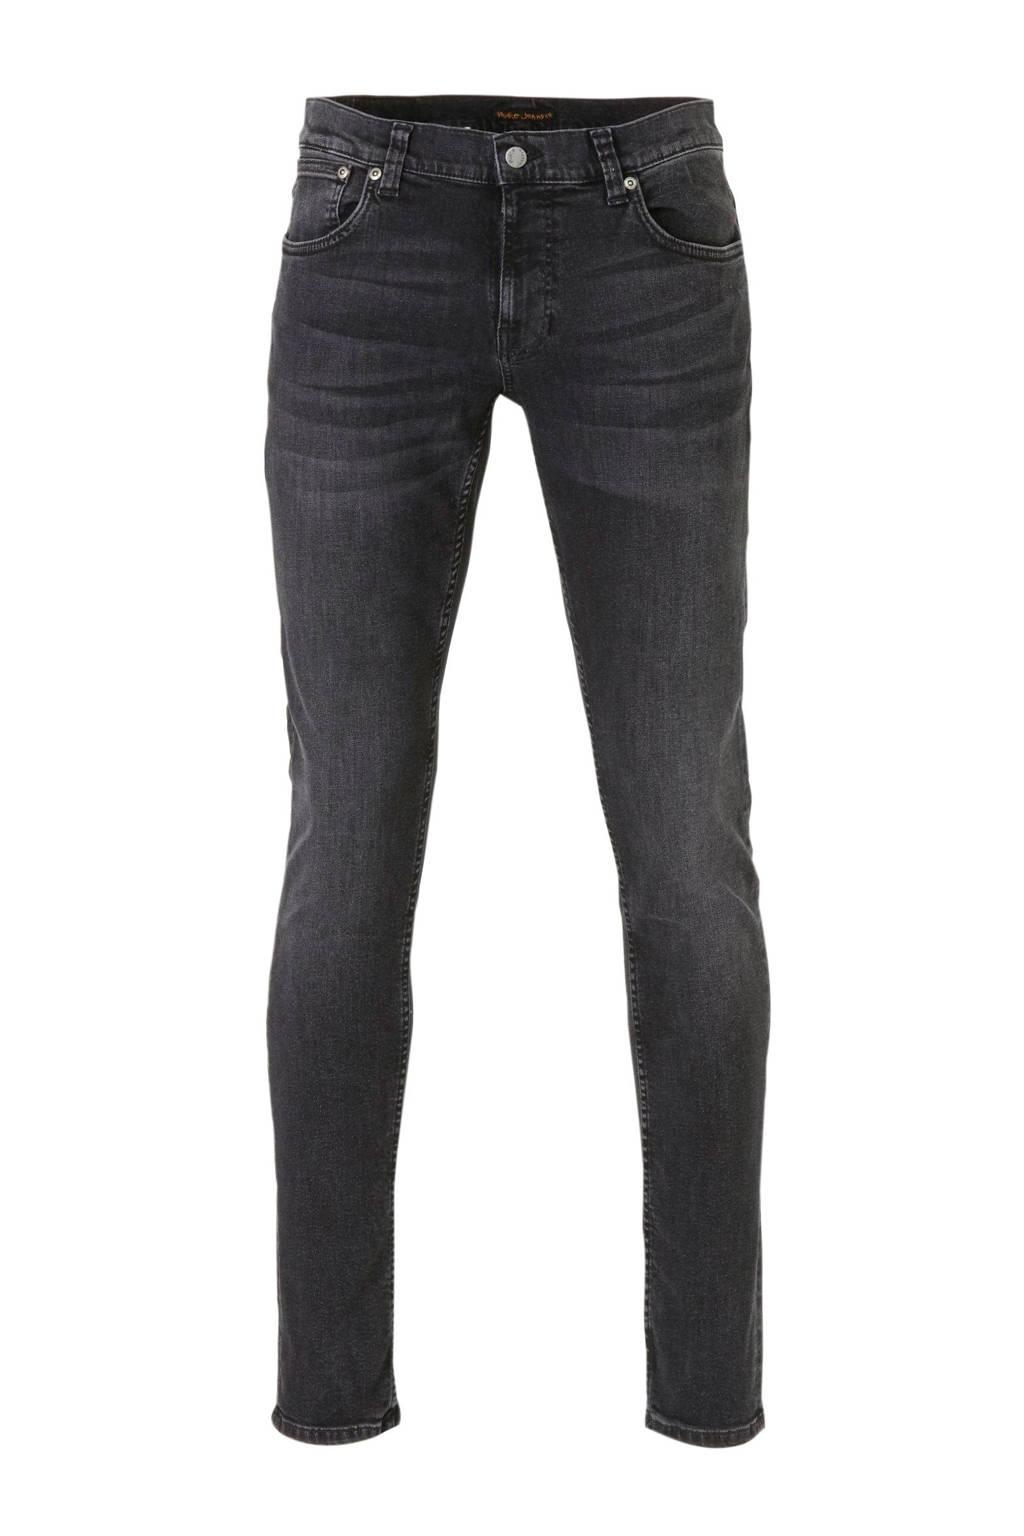 Nudie Jeans slim fit jeans Tight Terry black treats, Black Treats